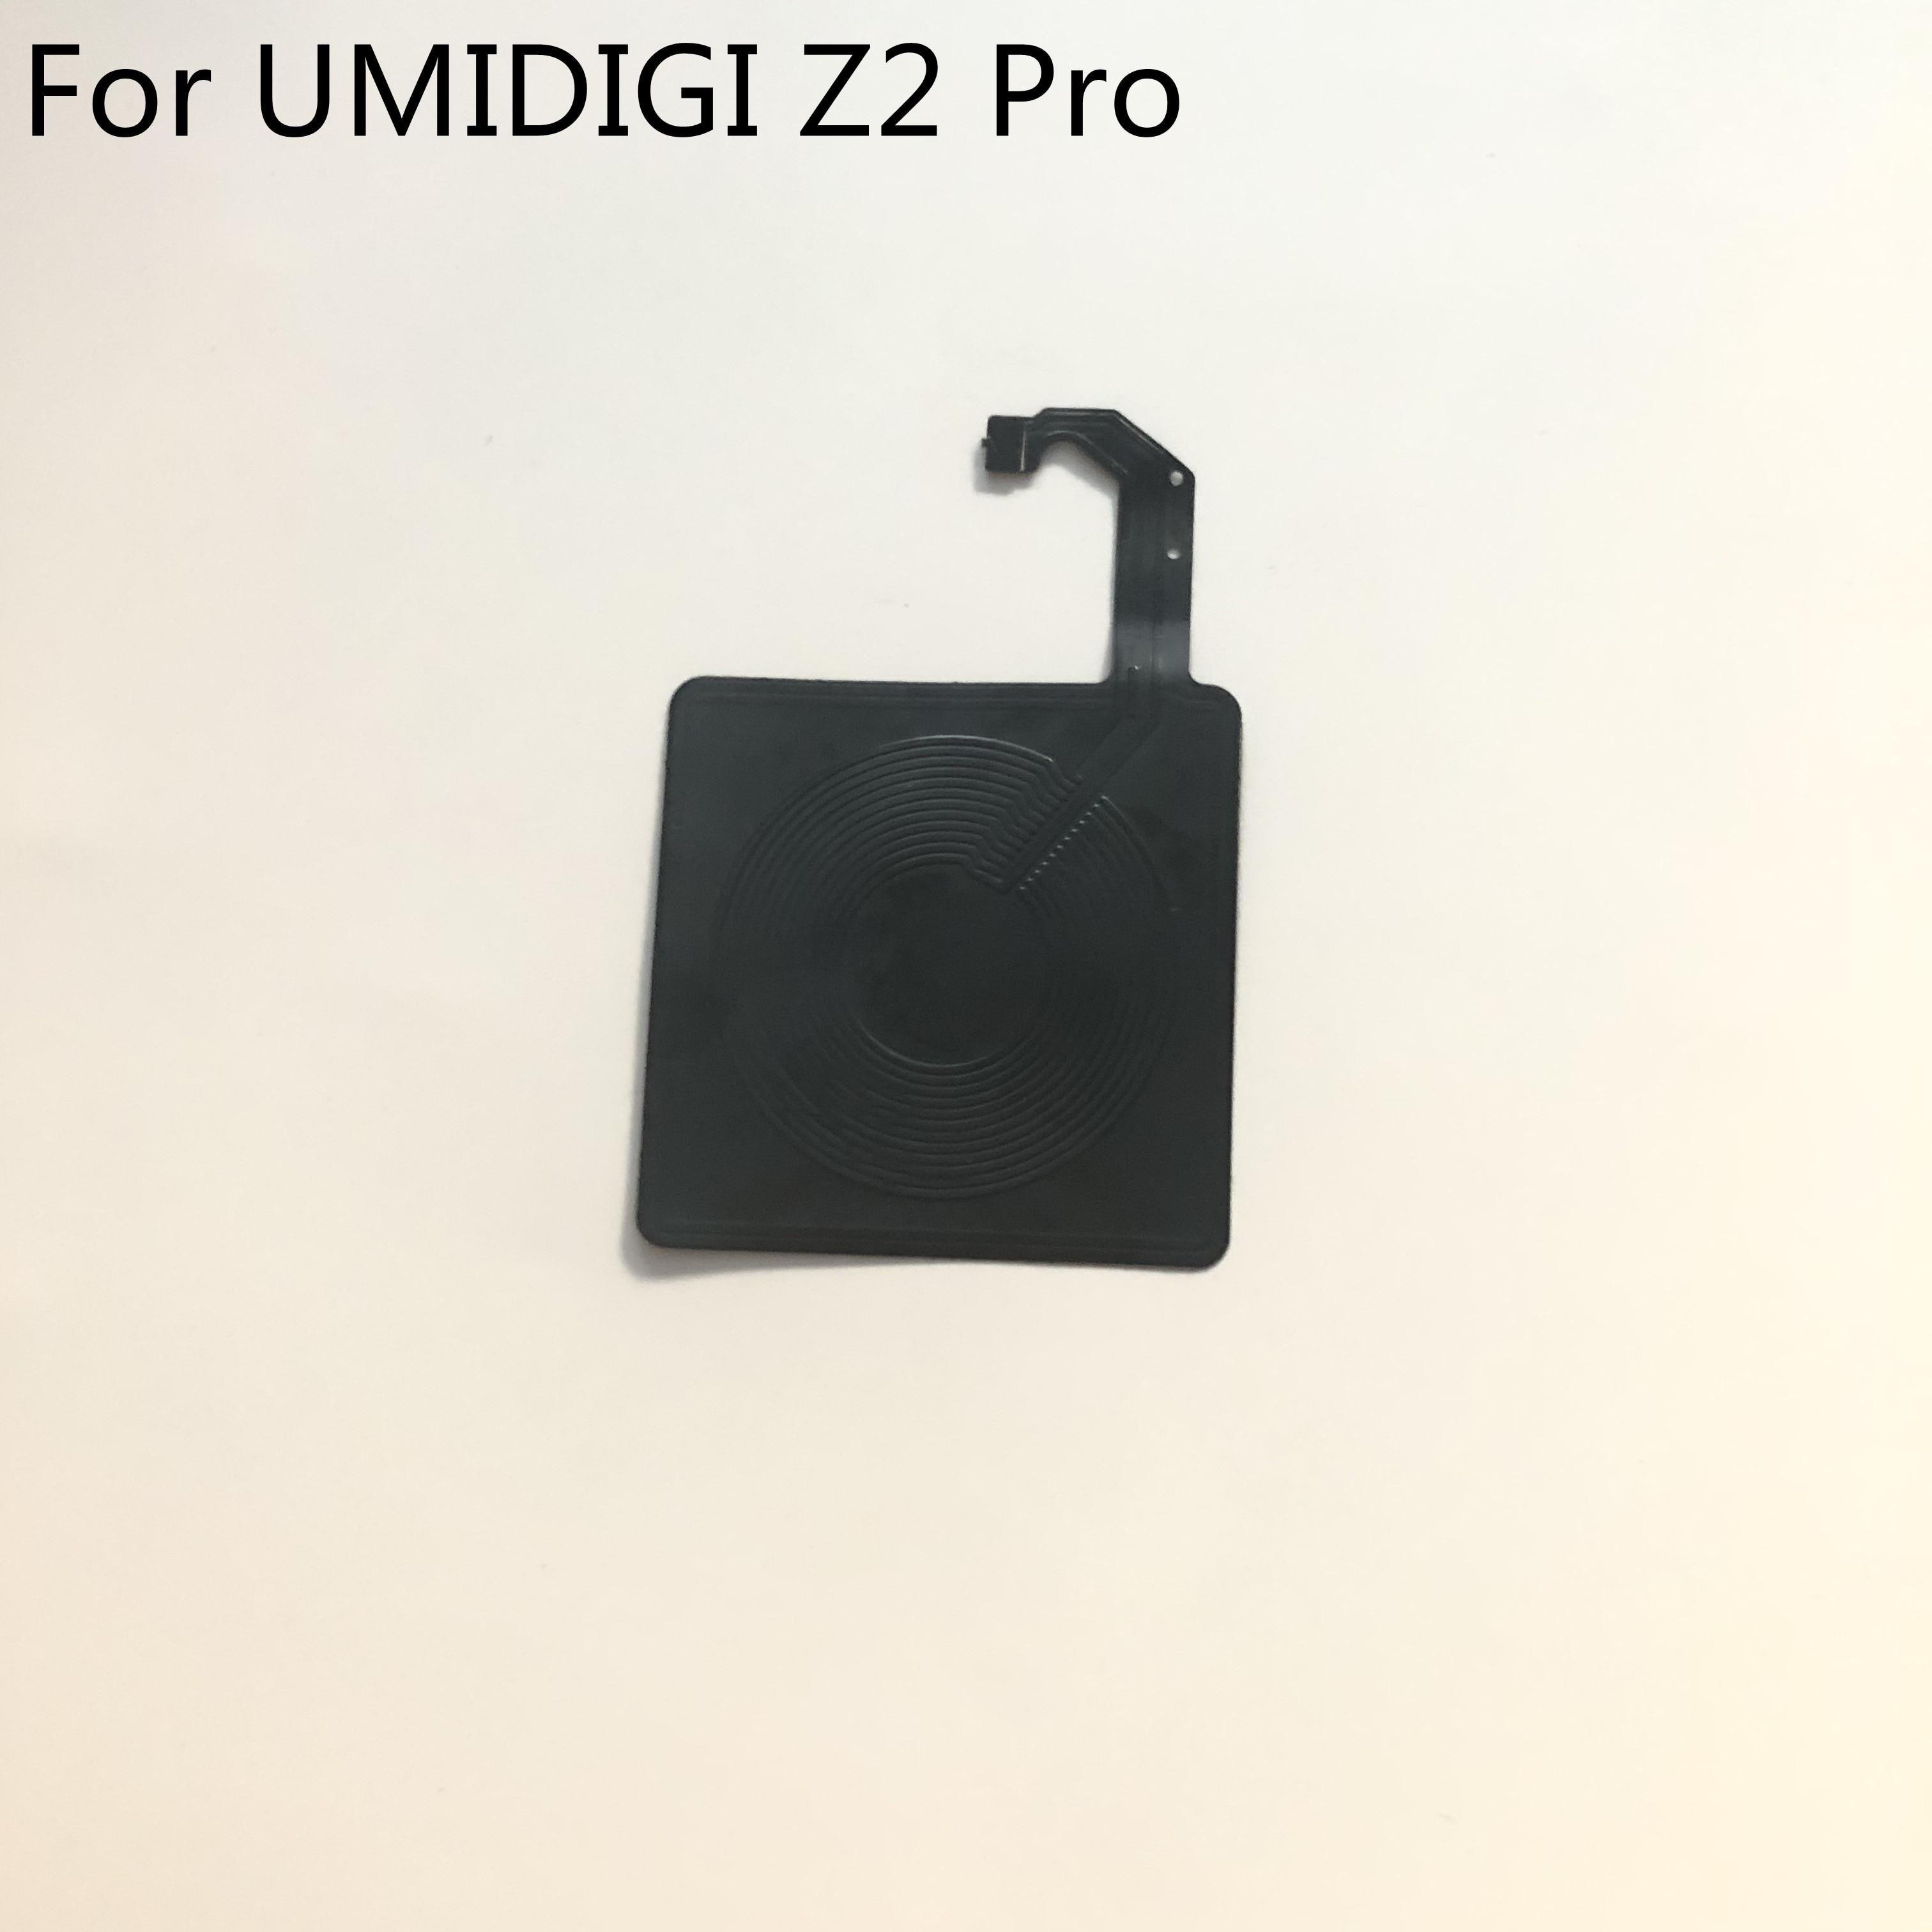 UMIDIGI Z2 Pro Used Wireless Charger For UMIDIGI Z2 Pro MTK6771 Helio P60 6.2